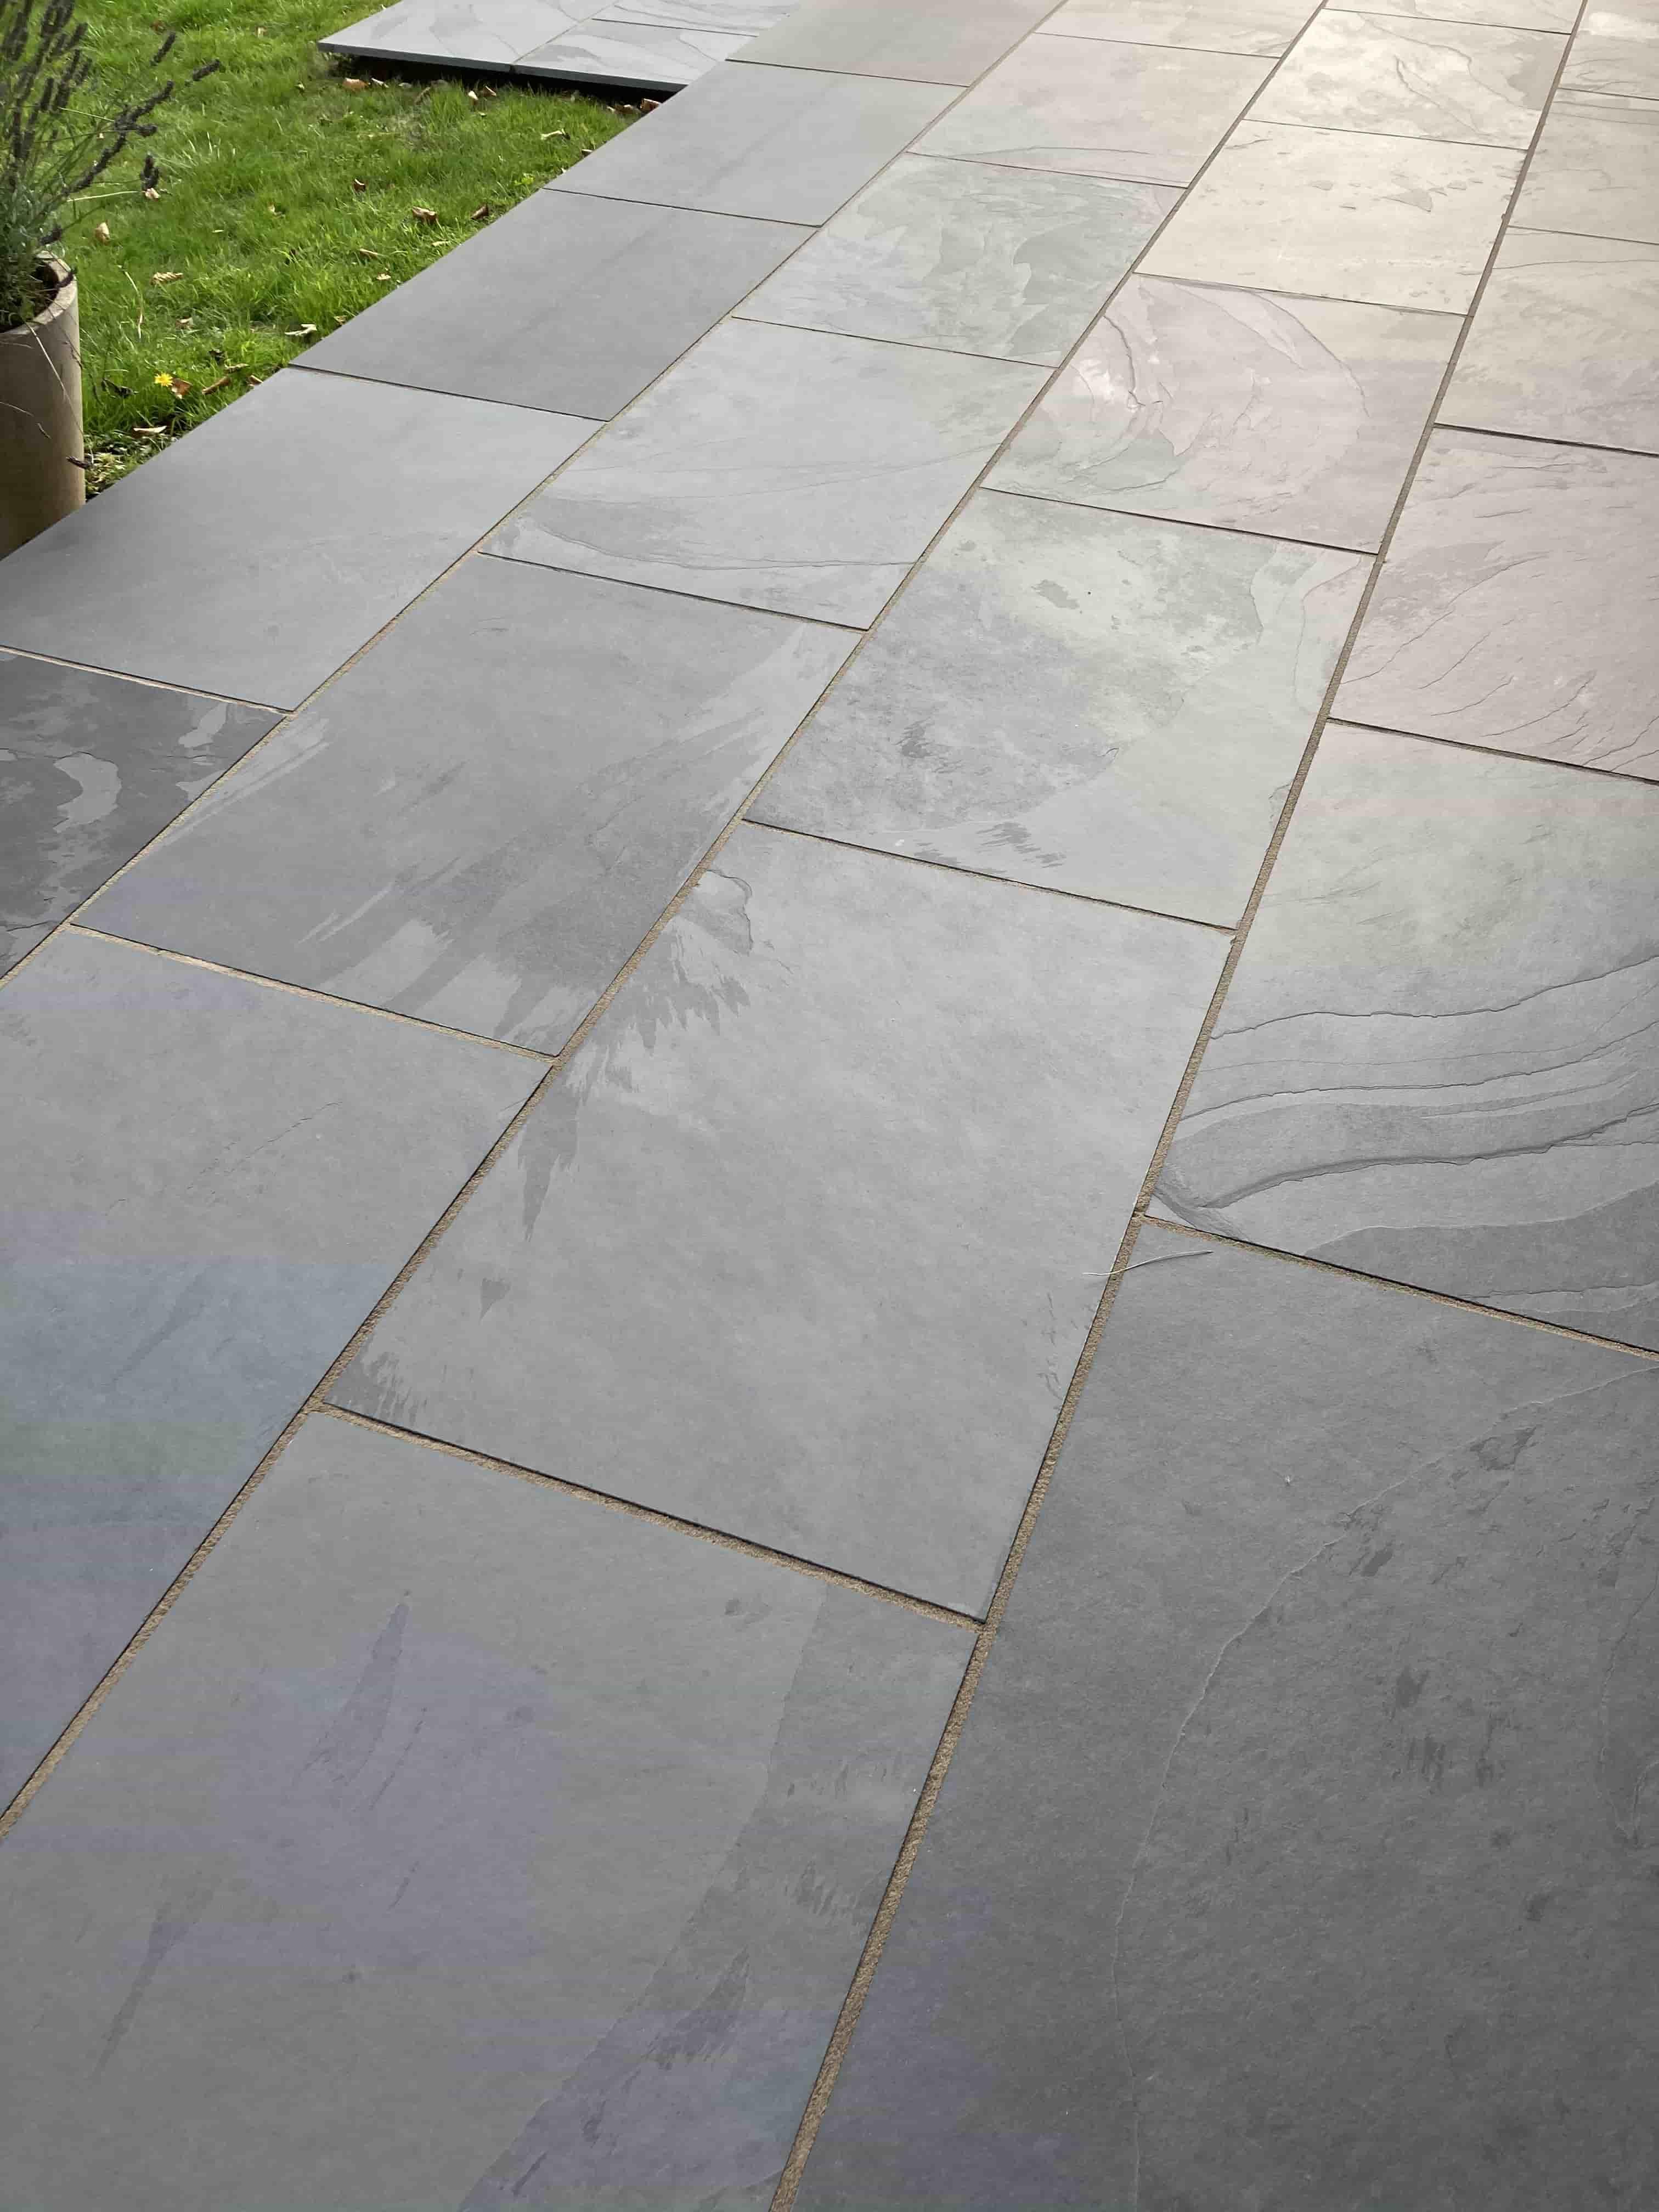 Slate Patio After Renovation Pembury